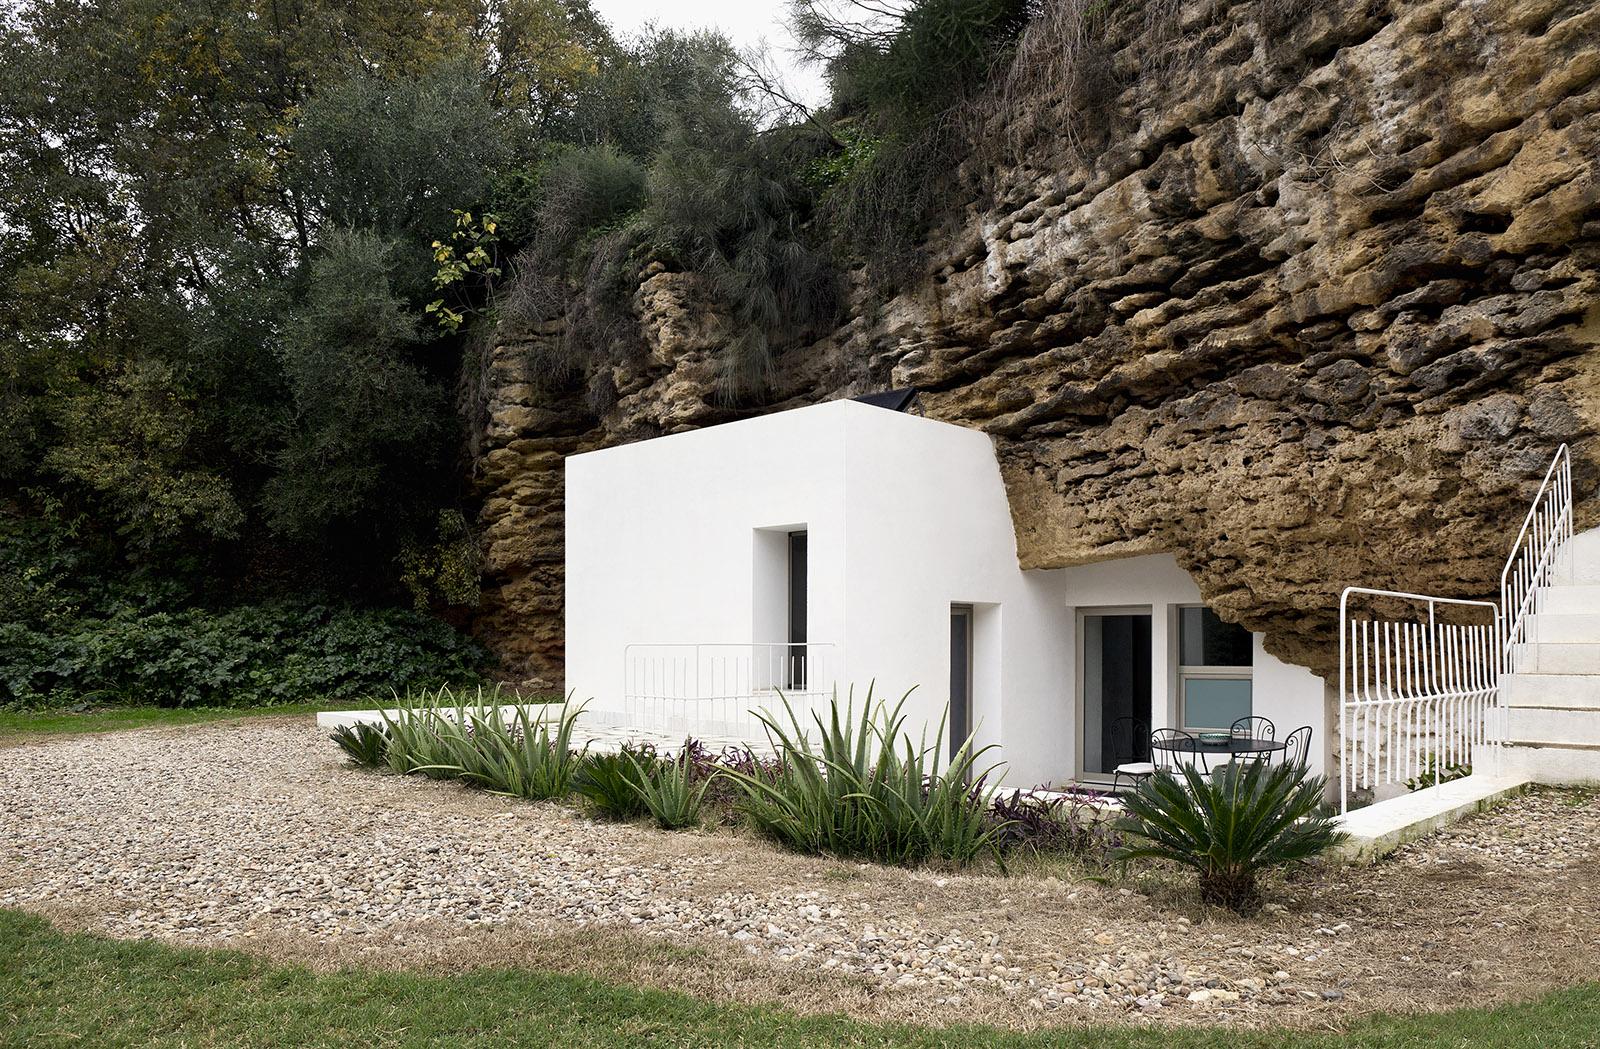 10. Cave House in Villarrubia Córdoba - Casa Tierra: a Cave House in Córdoba by UMMO Estudio